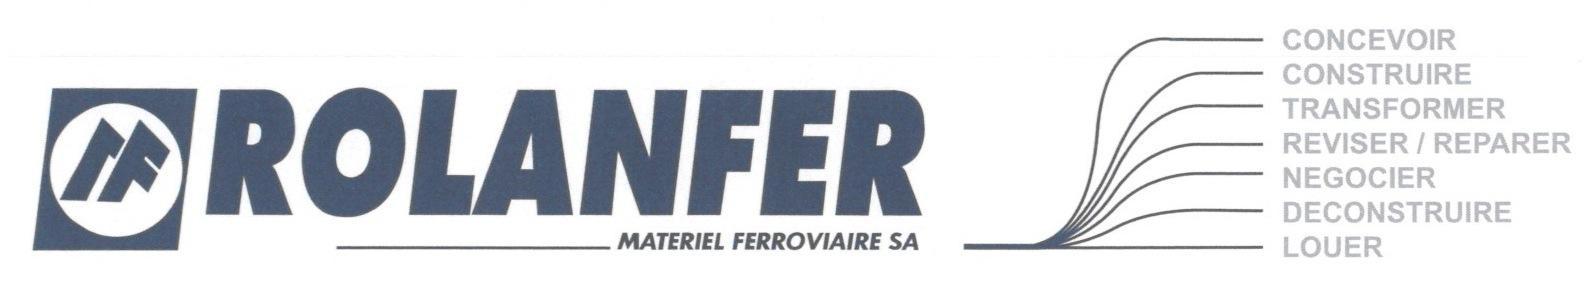 ROLANFER MATERIEL FERROVIAIRE